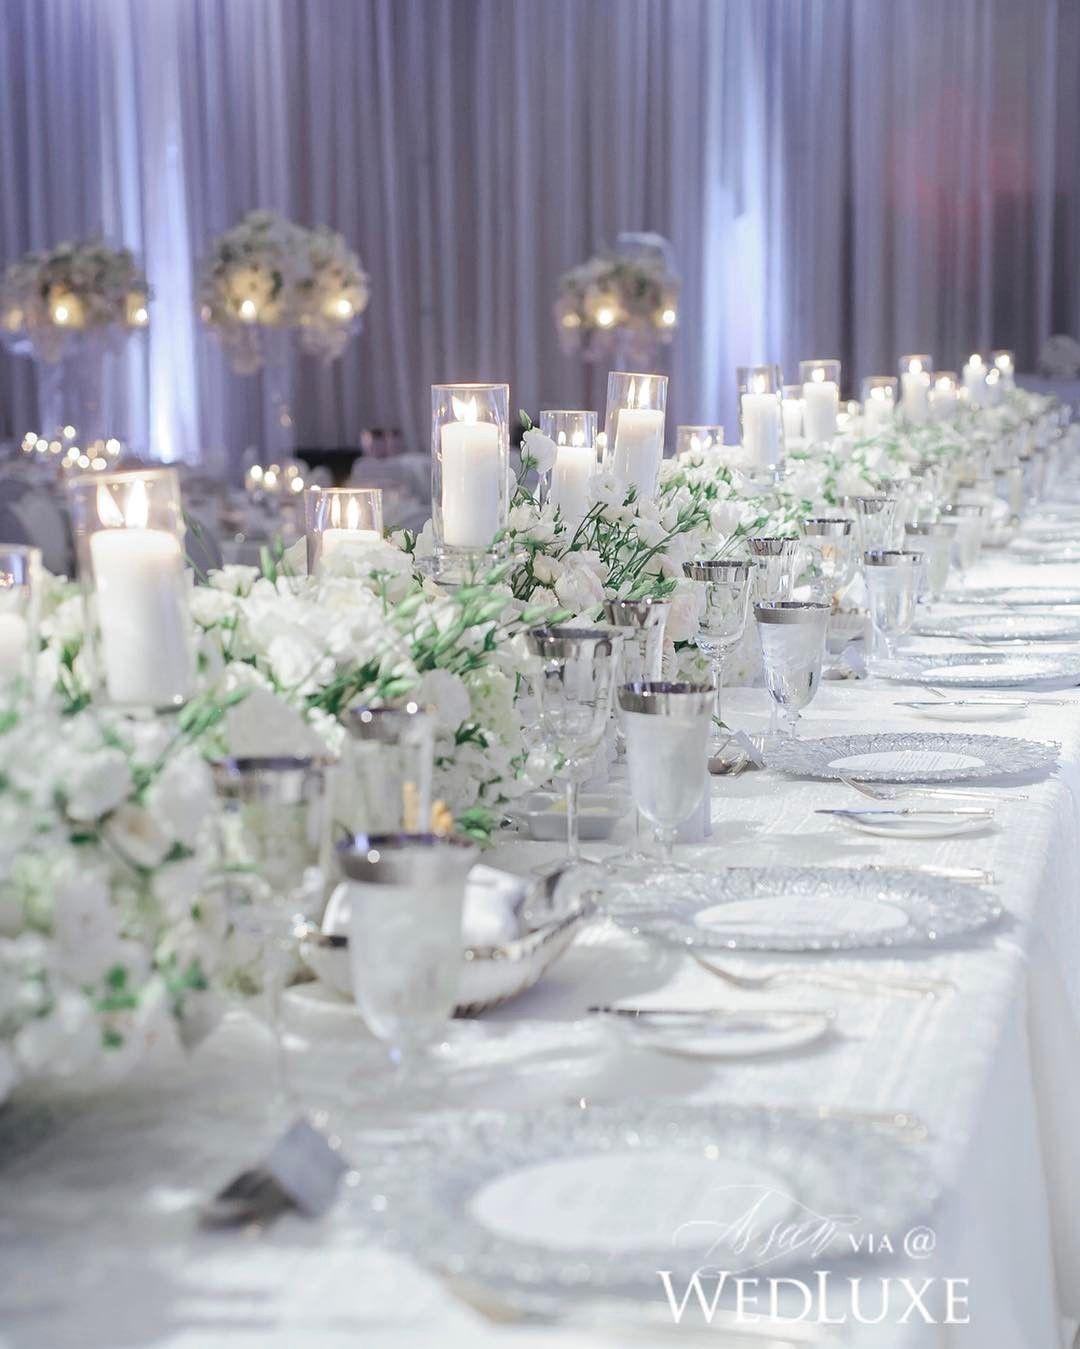 WedLuxe Media (@wedluxe) • Fotos y vídeos de Instagram | weddings ...